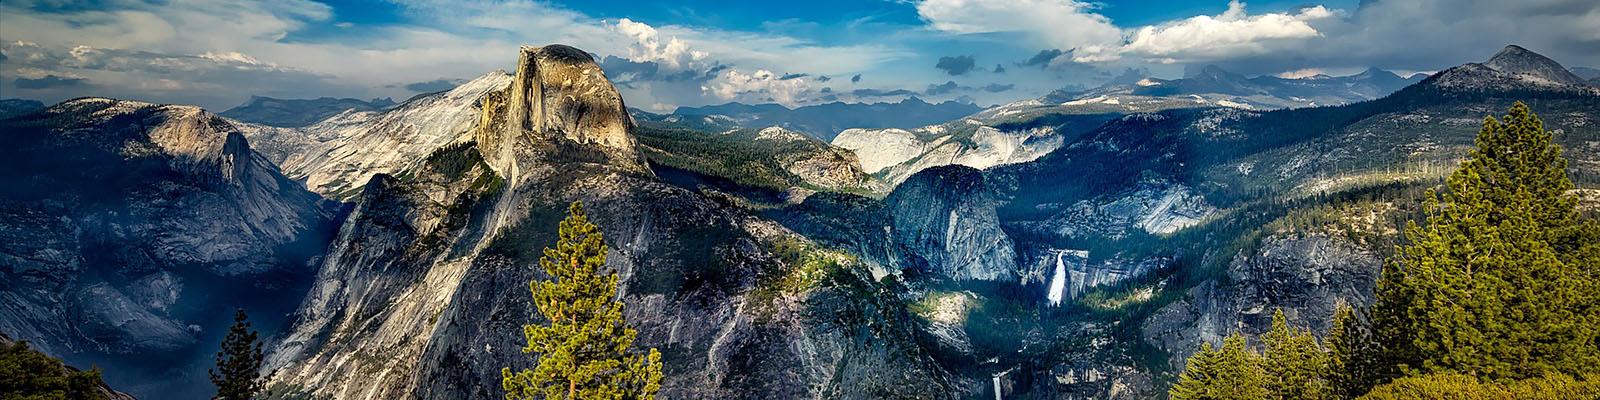 Guided Yosemite Hiking Tours | Guided Yosemite Backpacking Trips